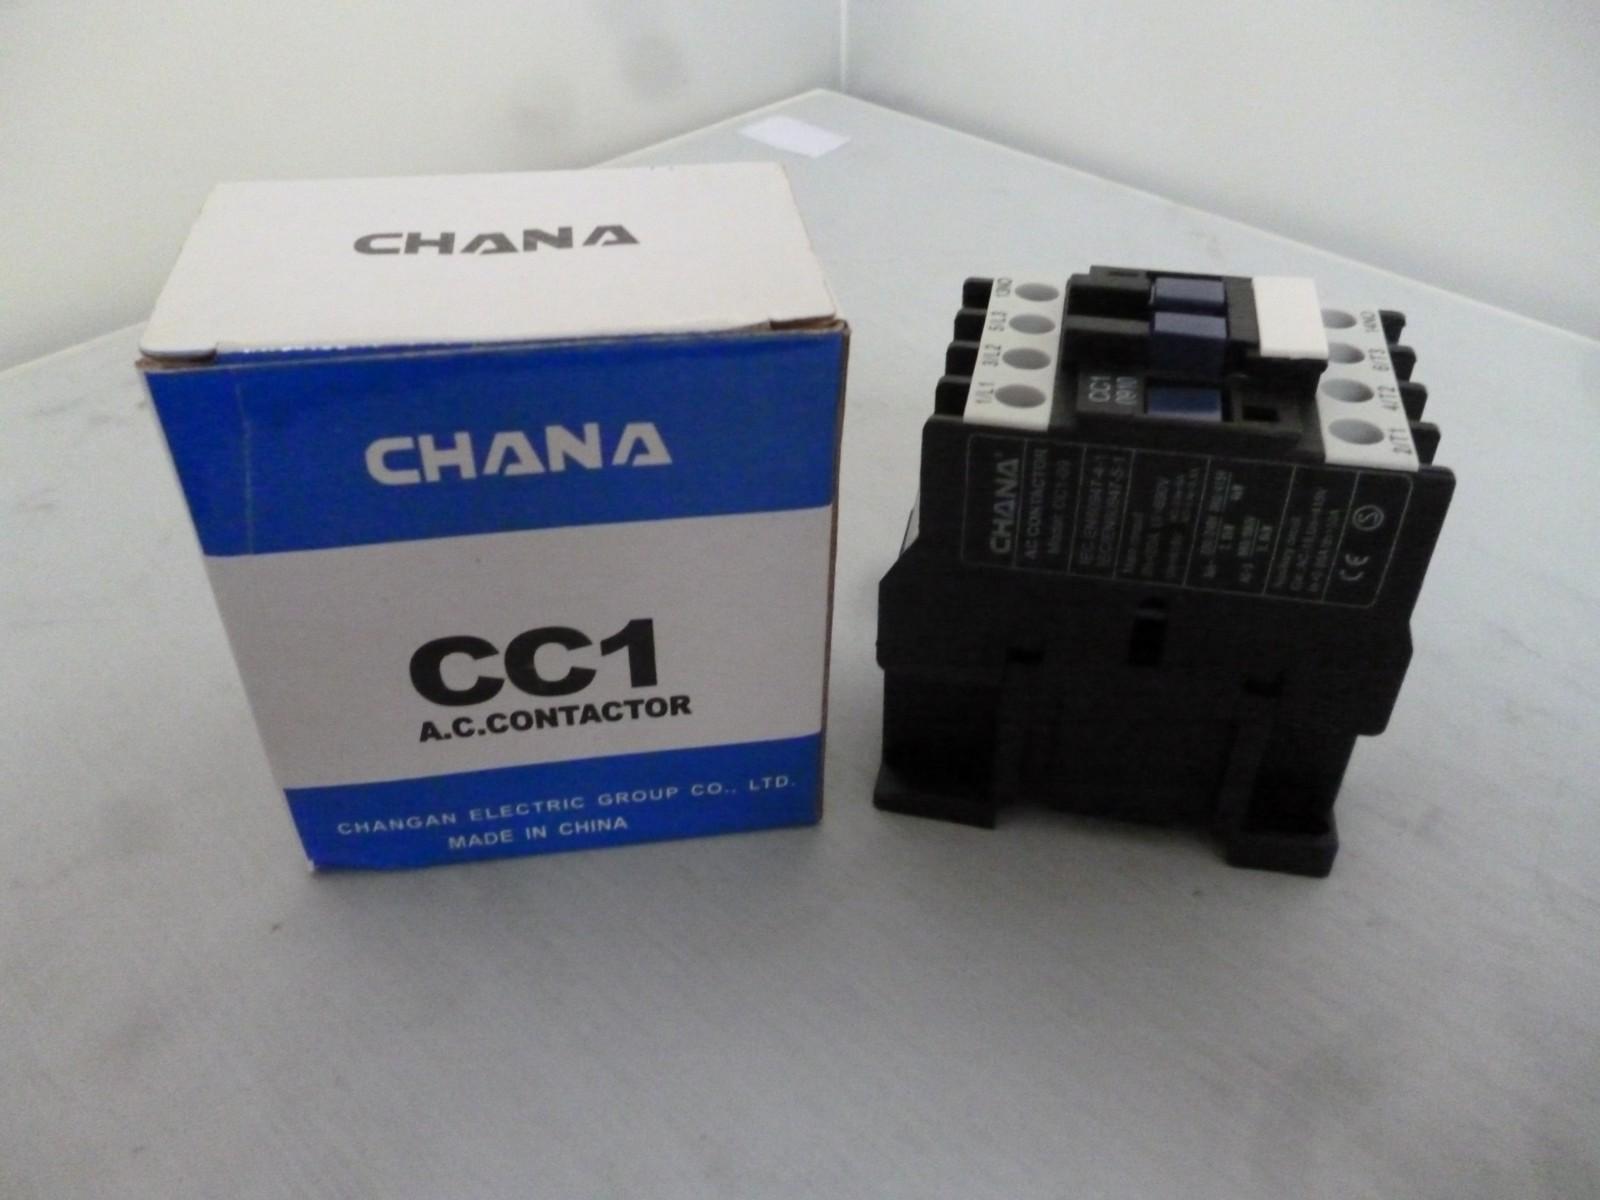 Chana CC1-0910 3 Pole Contactor